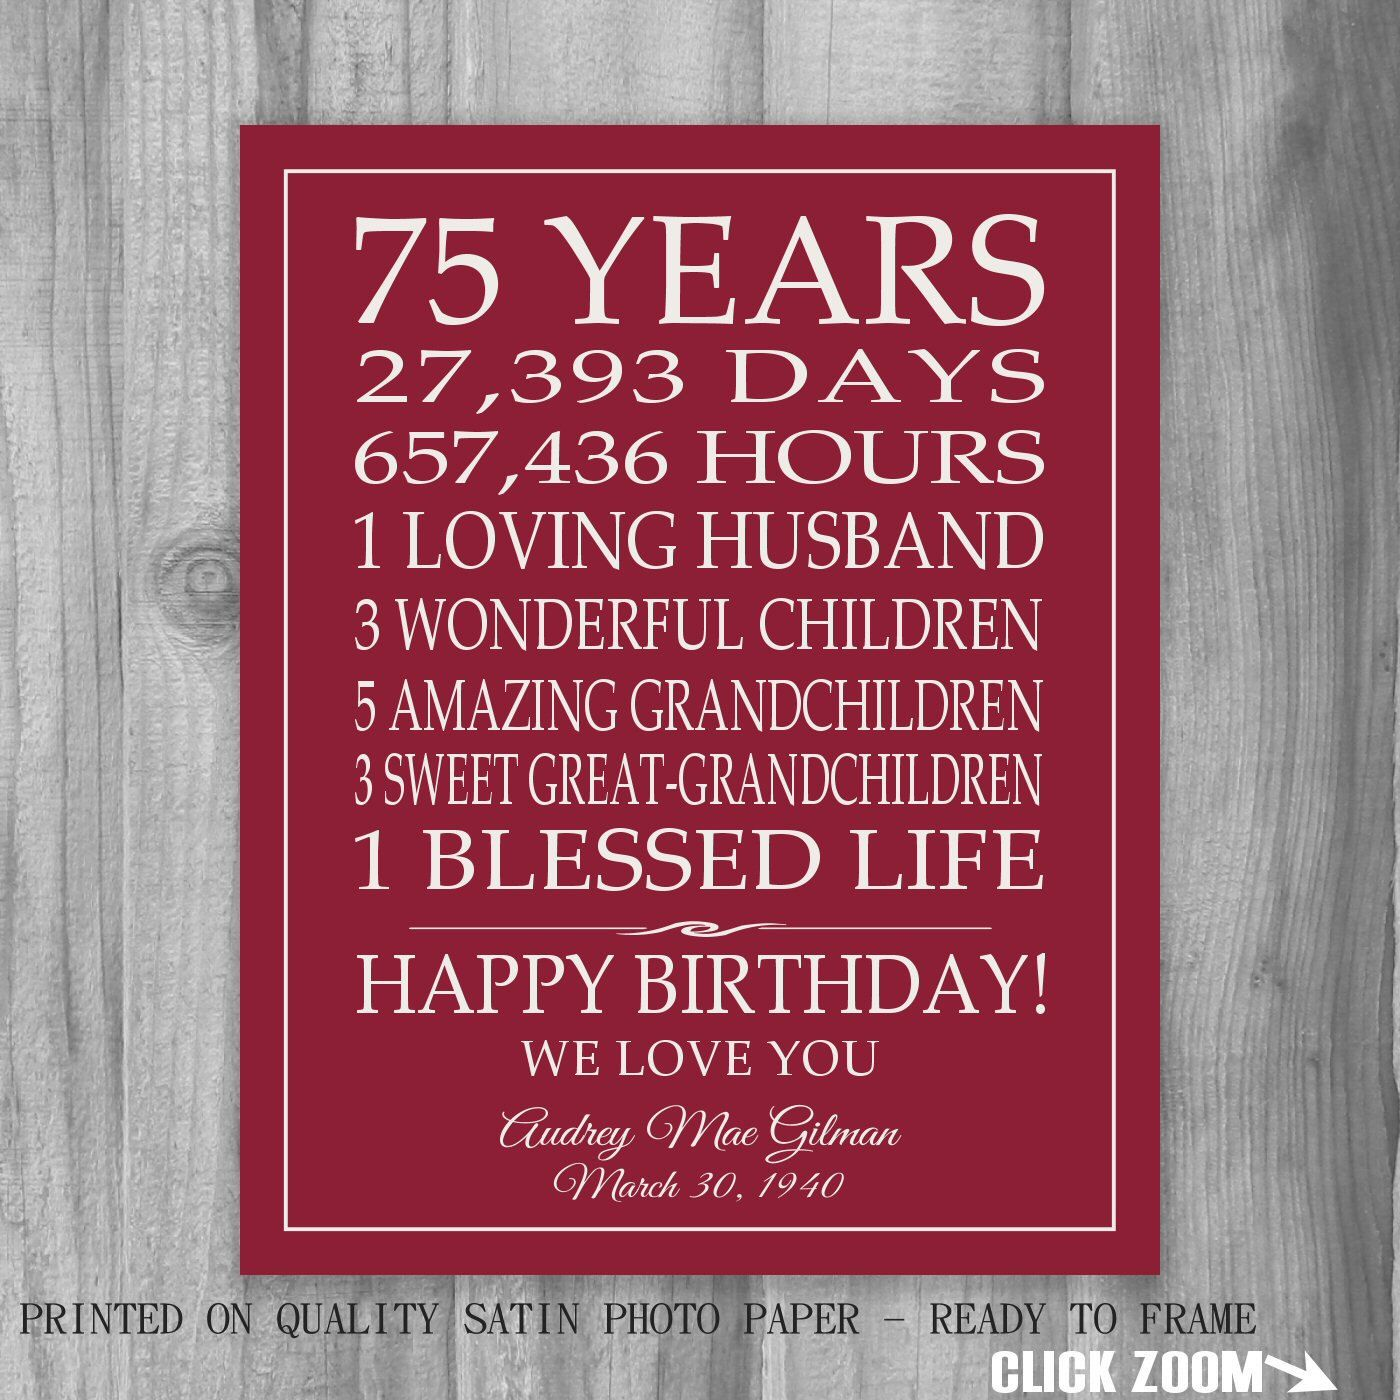 75th BIRTHDAY GIFT Sign Print Personalized Art Mom Dad Grandma Birthday Best Friend Or Digital